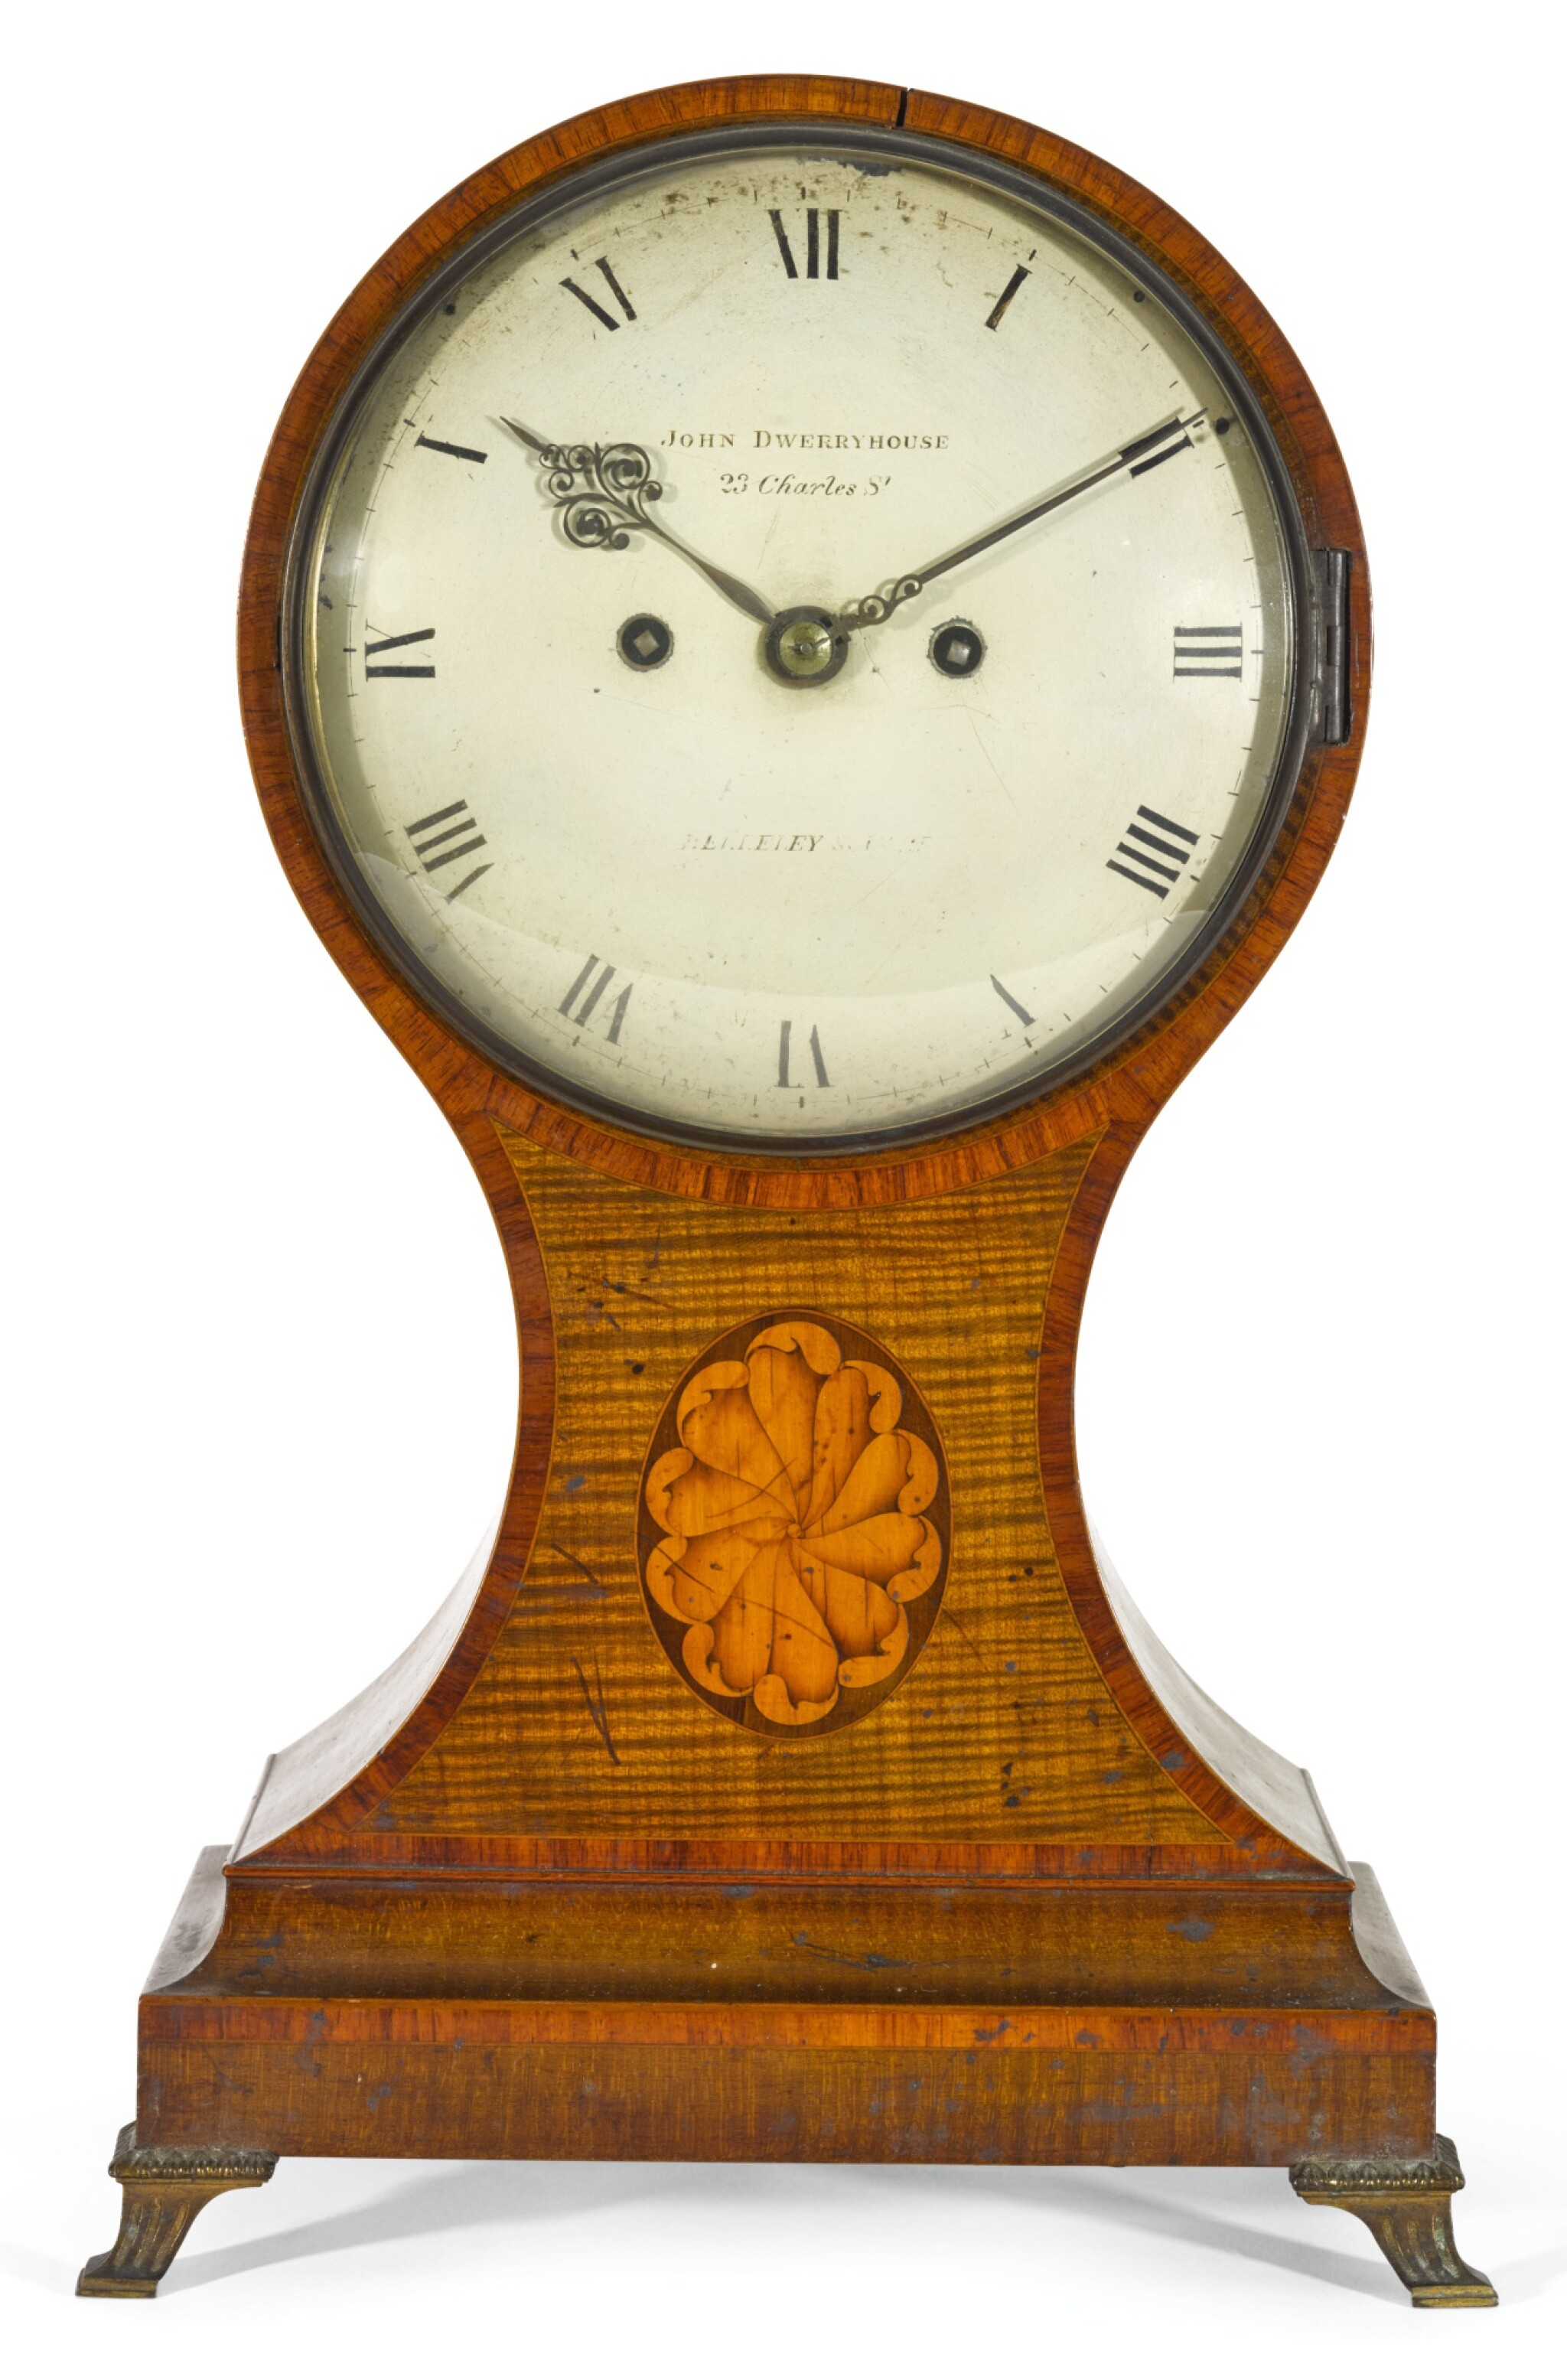 View full screen - View 1 of Lot 37. A GEORGE III TULIPWOOD AND HAREWOOD BALLOON TABLE CLOCK, JOHN DWERRYHOUSE, LONDON, CIRCA 1790.